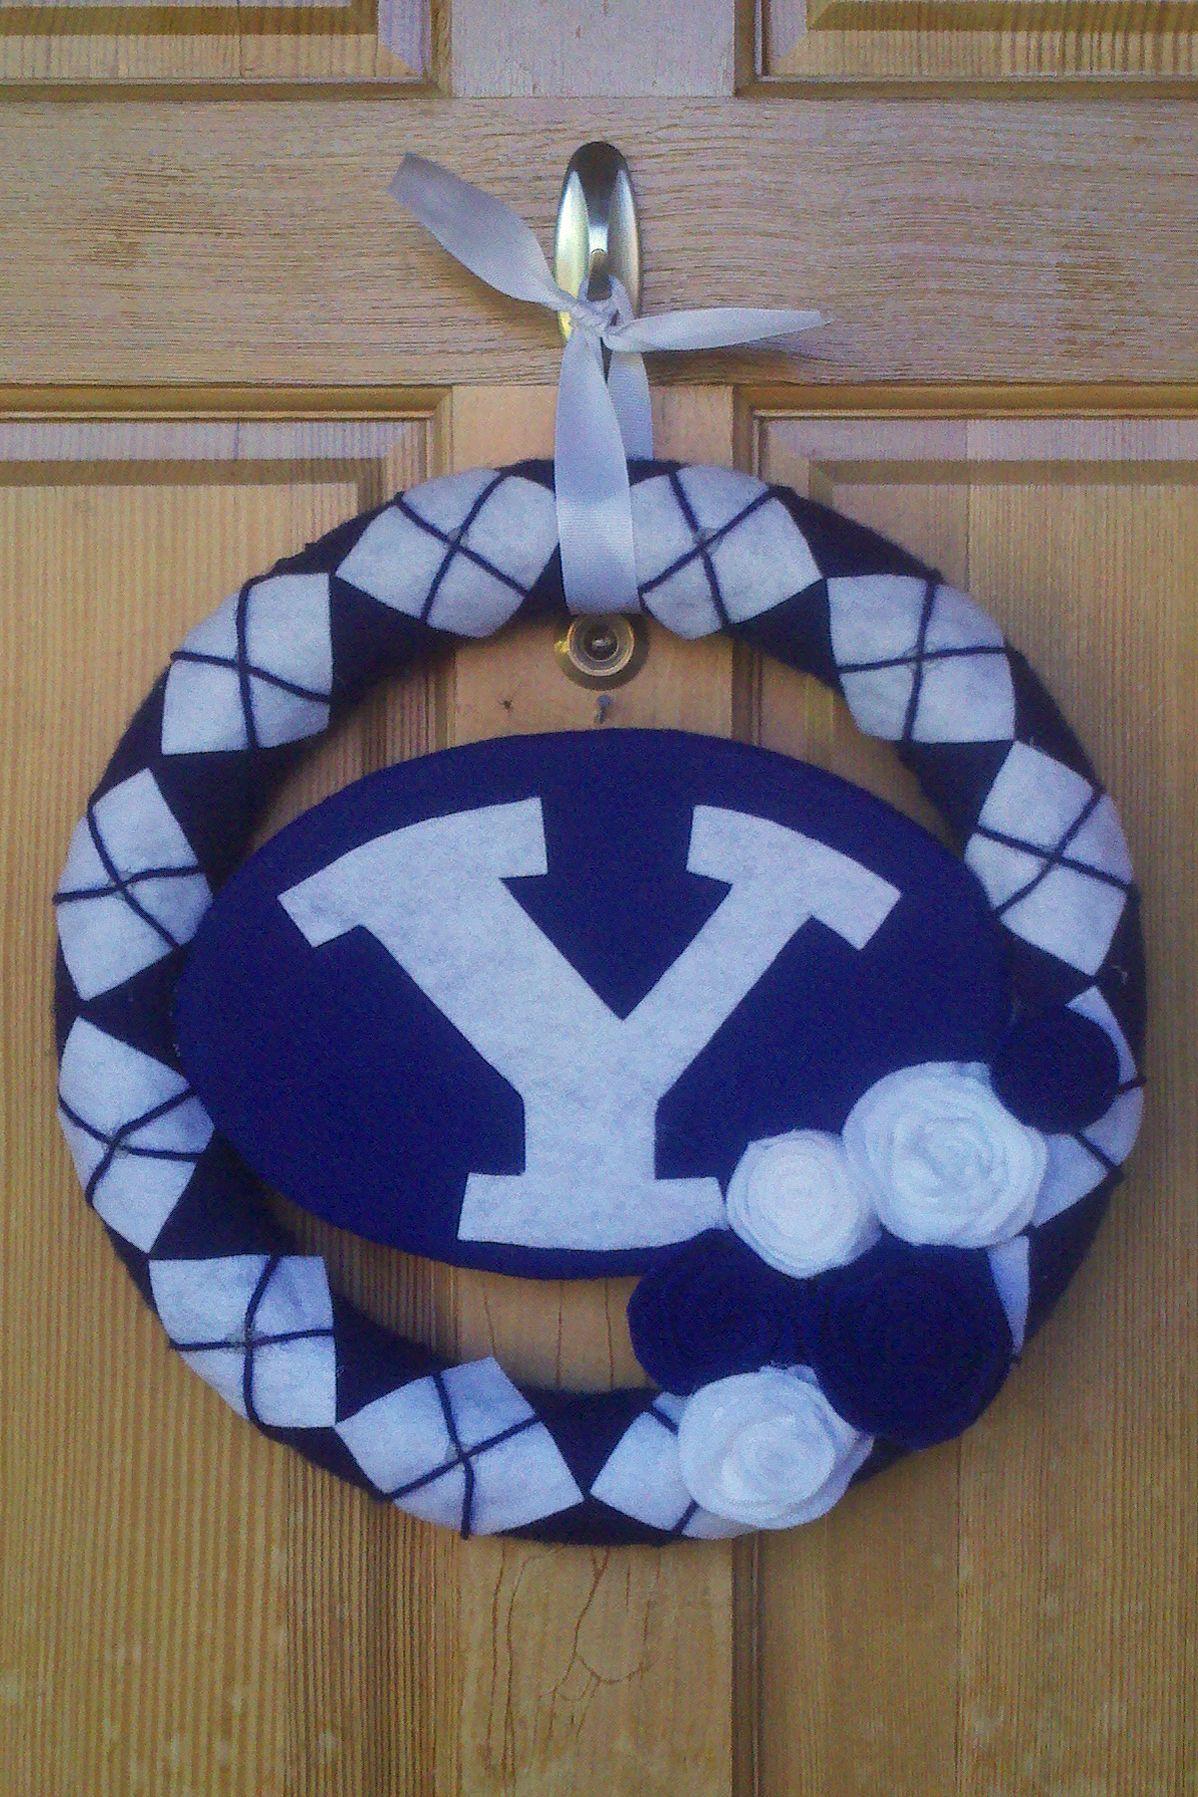 BYU wreath made out of felt/yarn How to make wreaths